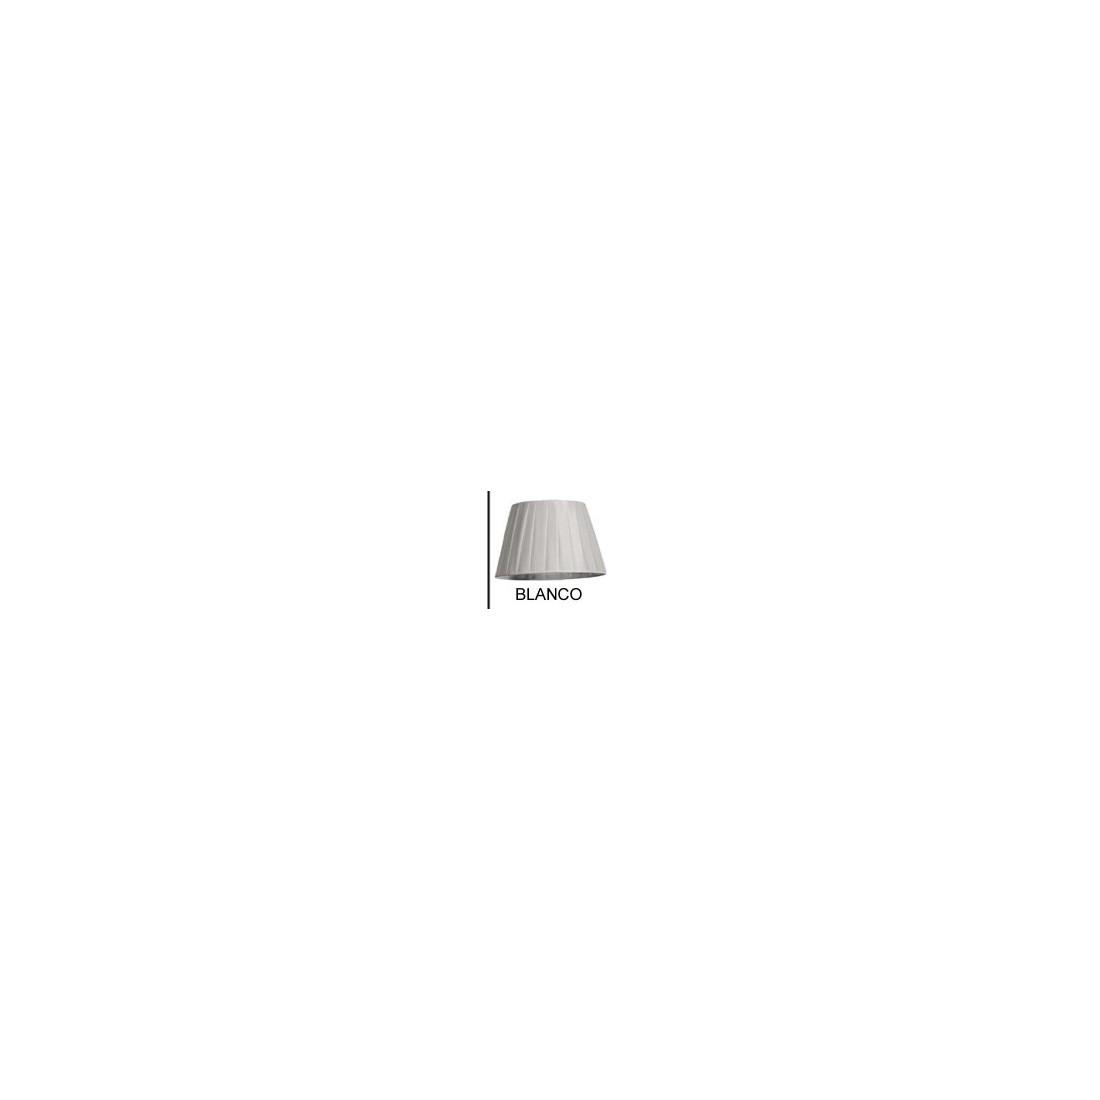 Lamparas nacar lamparas pantallas nacar lamparas nacar online iluminacion nacar - Pantallas de lamparas ...